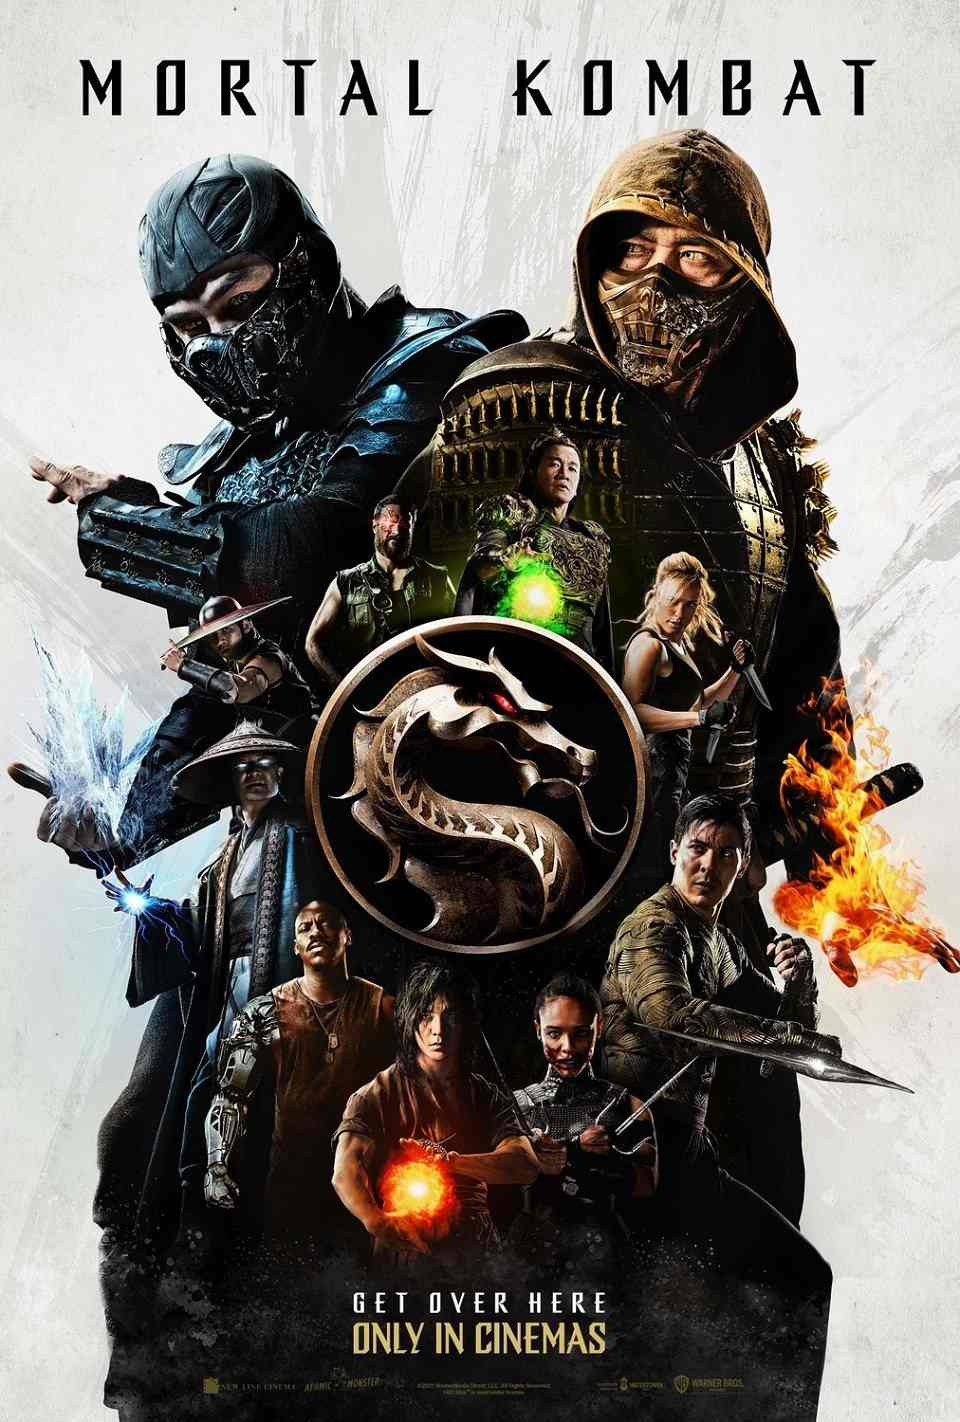 Mortal Kombat 2021 official poster